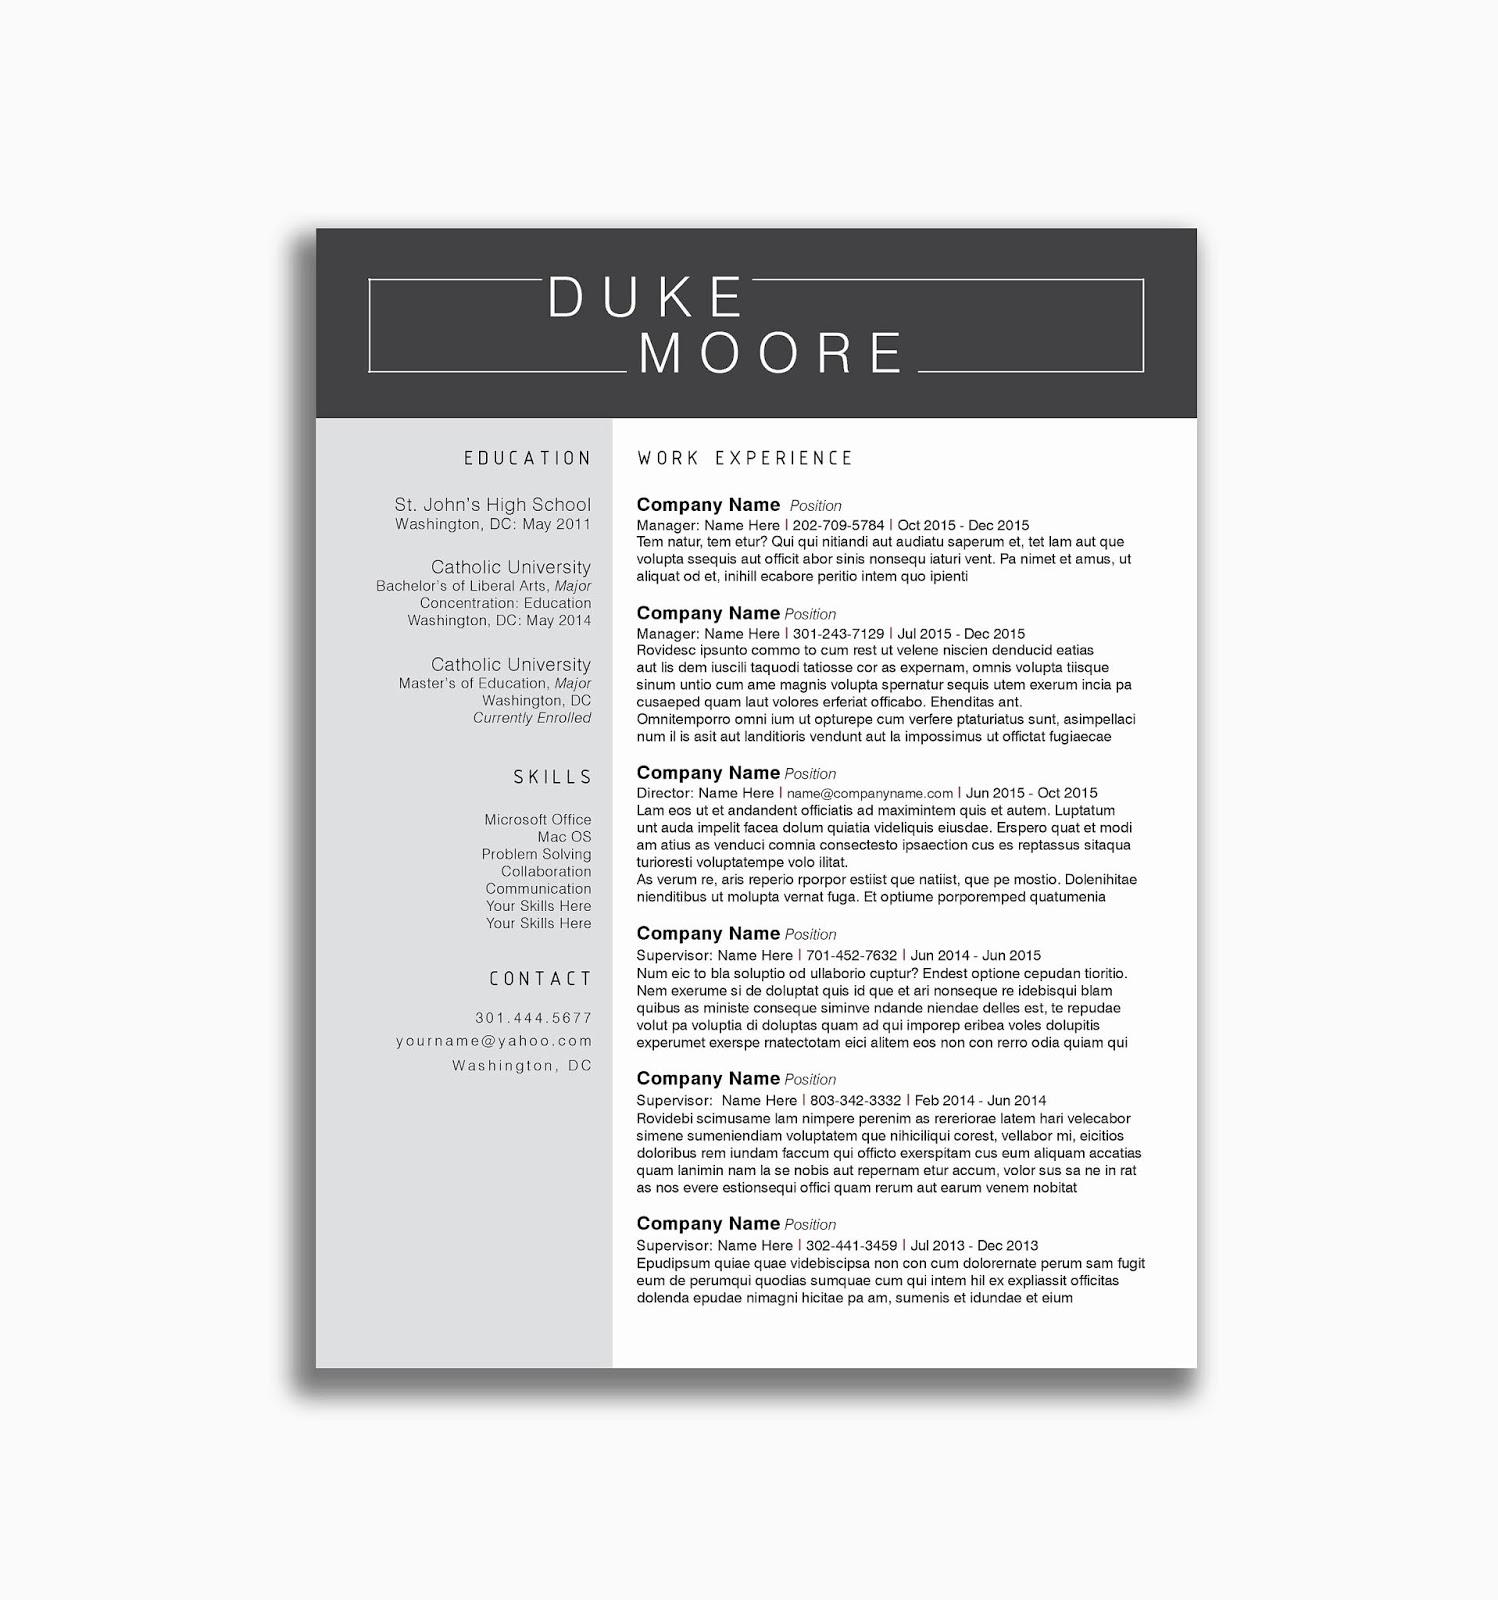 job description of a banquet server for resume